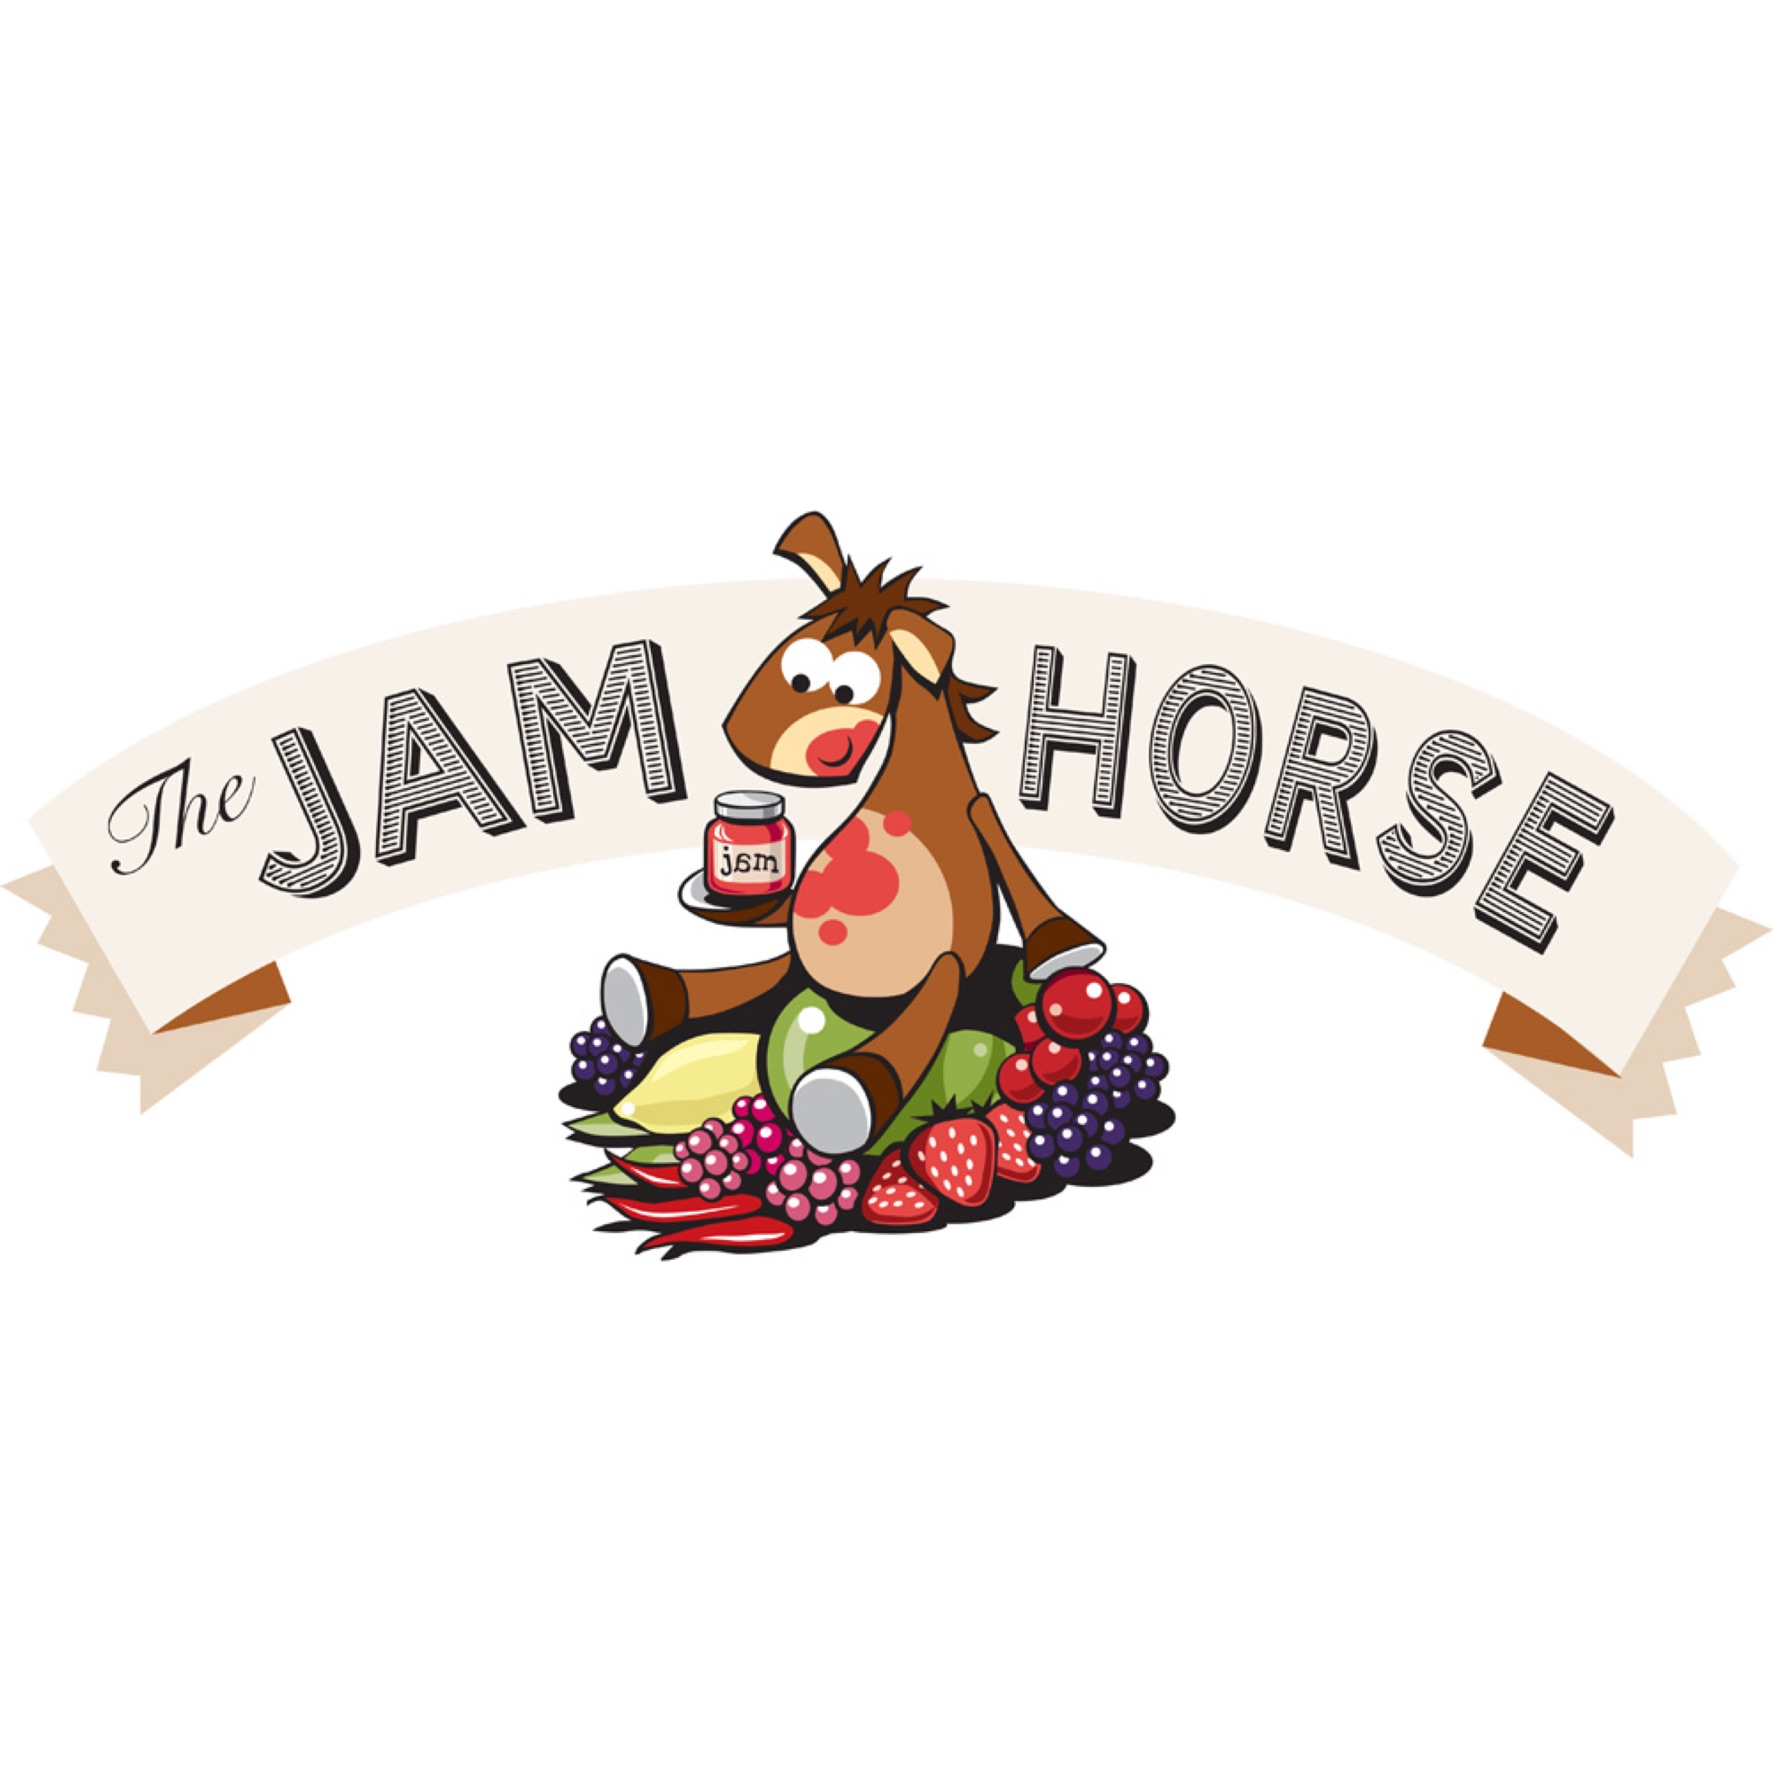 The Jam Horse